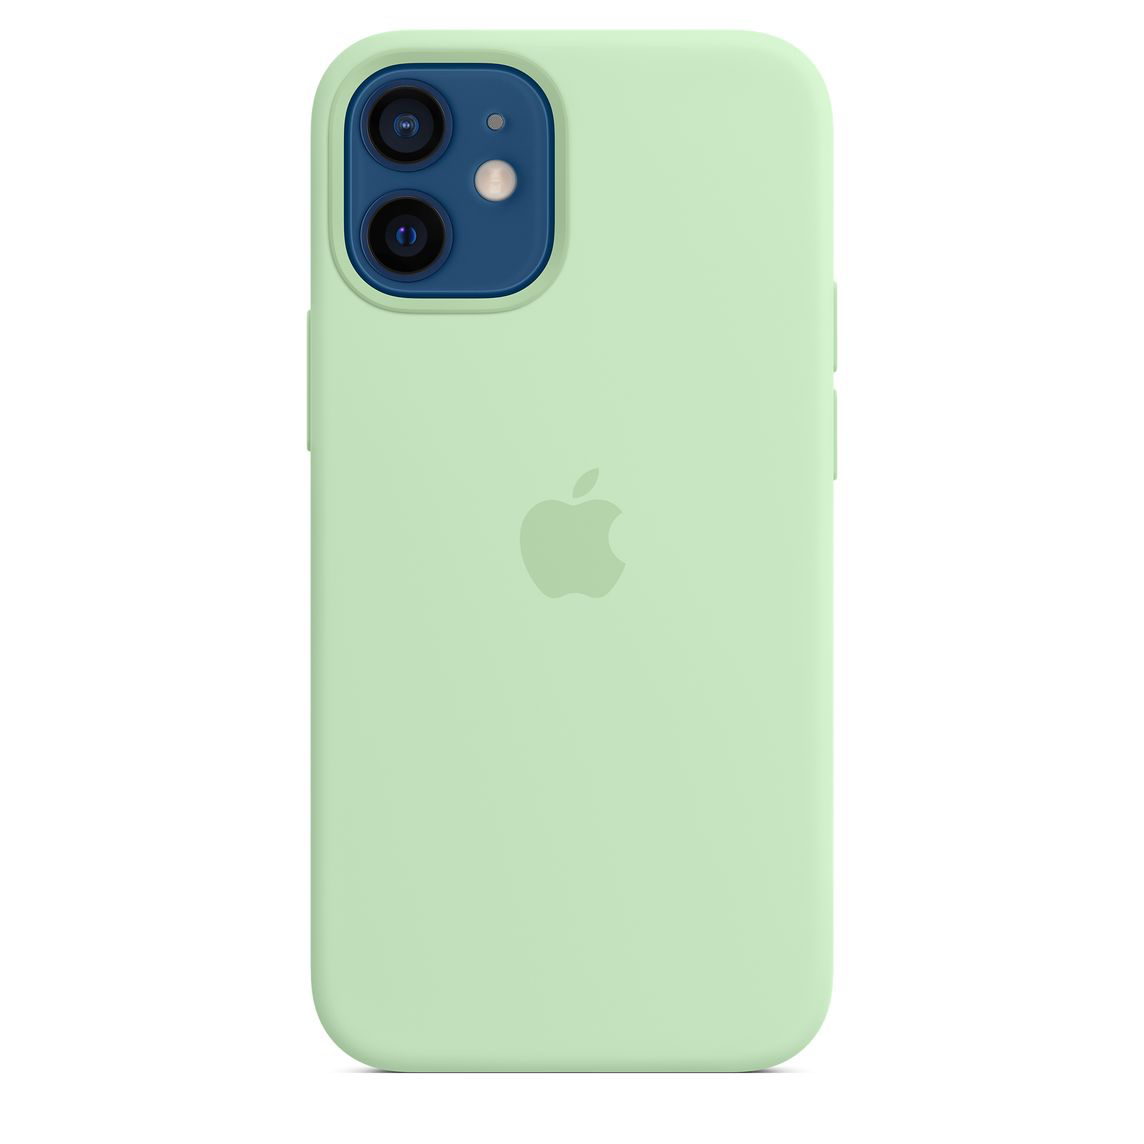 Apple iPhone 12 mini Silicone Case with MagSafe Pistachio